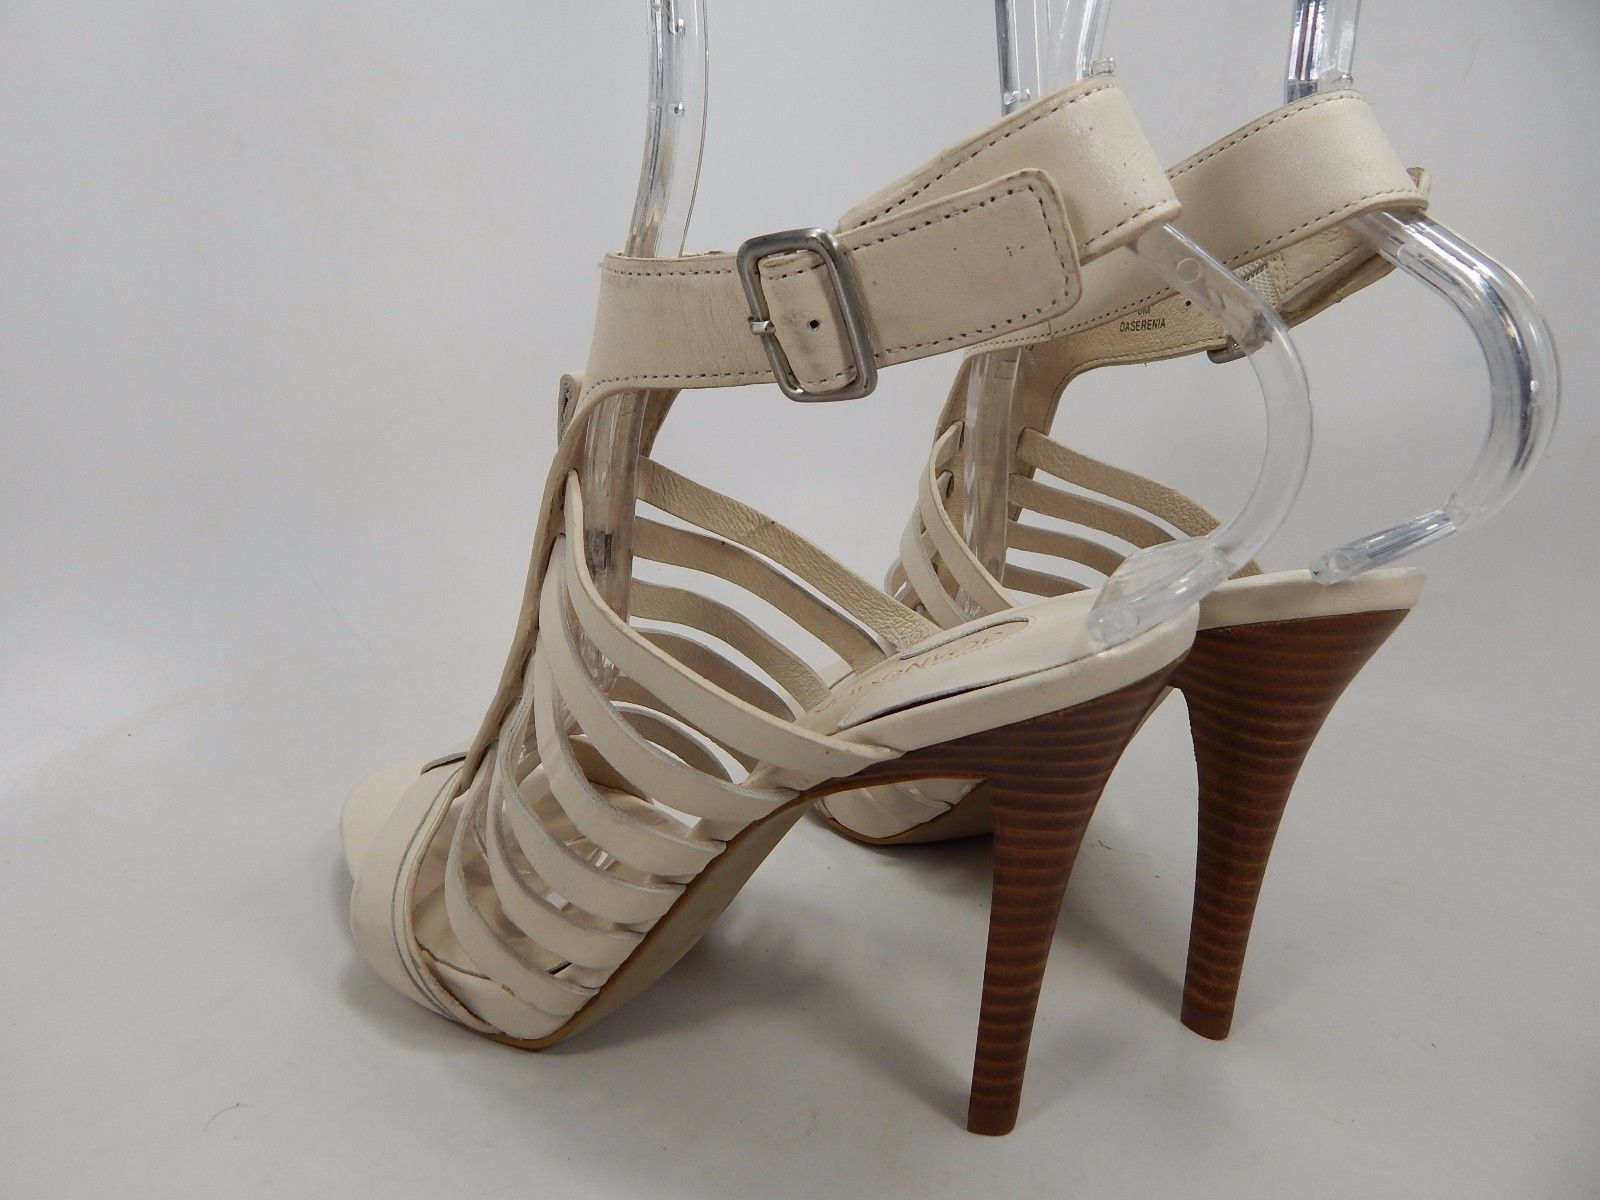 Joan & David Daserenia Open Toe High Heels Sandals Women's Size US 6 Ivory